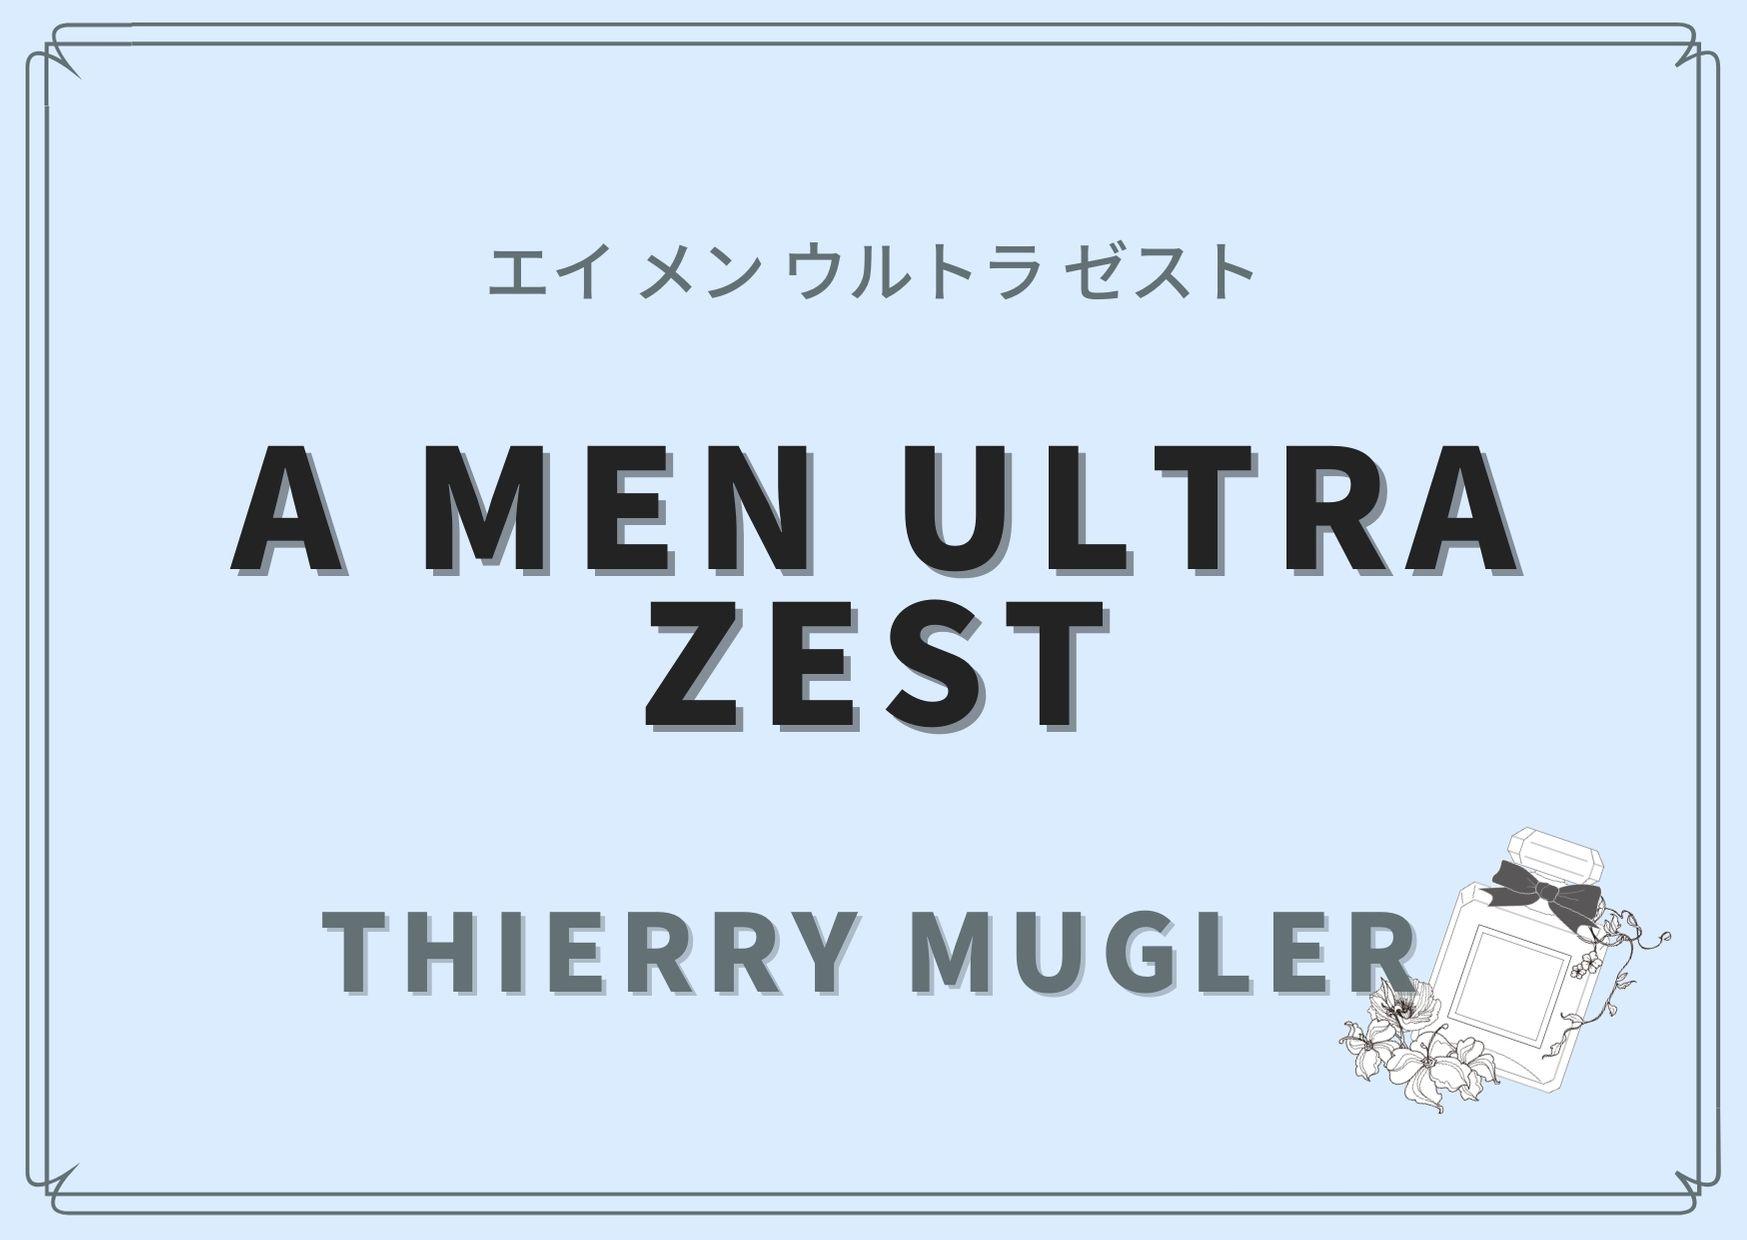 A MEN ULTRA ZEST(エイ メン ウルトラ ゼスト)/Thierry Mugler(ティエリー ミュグレー)